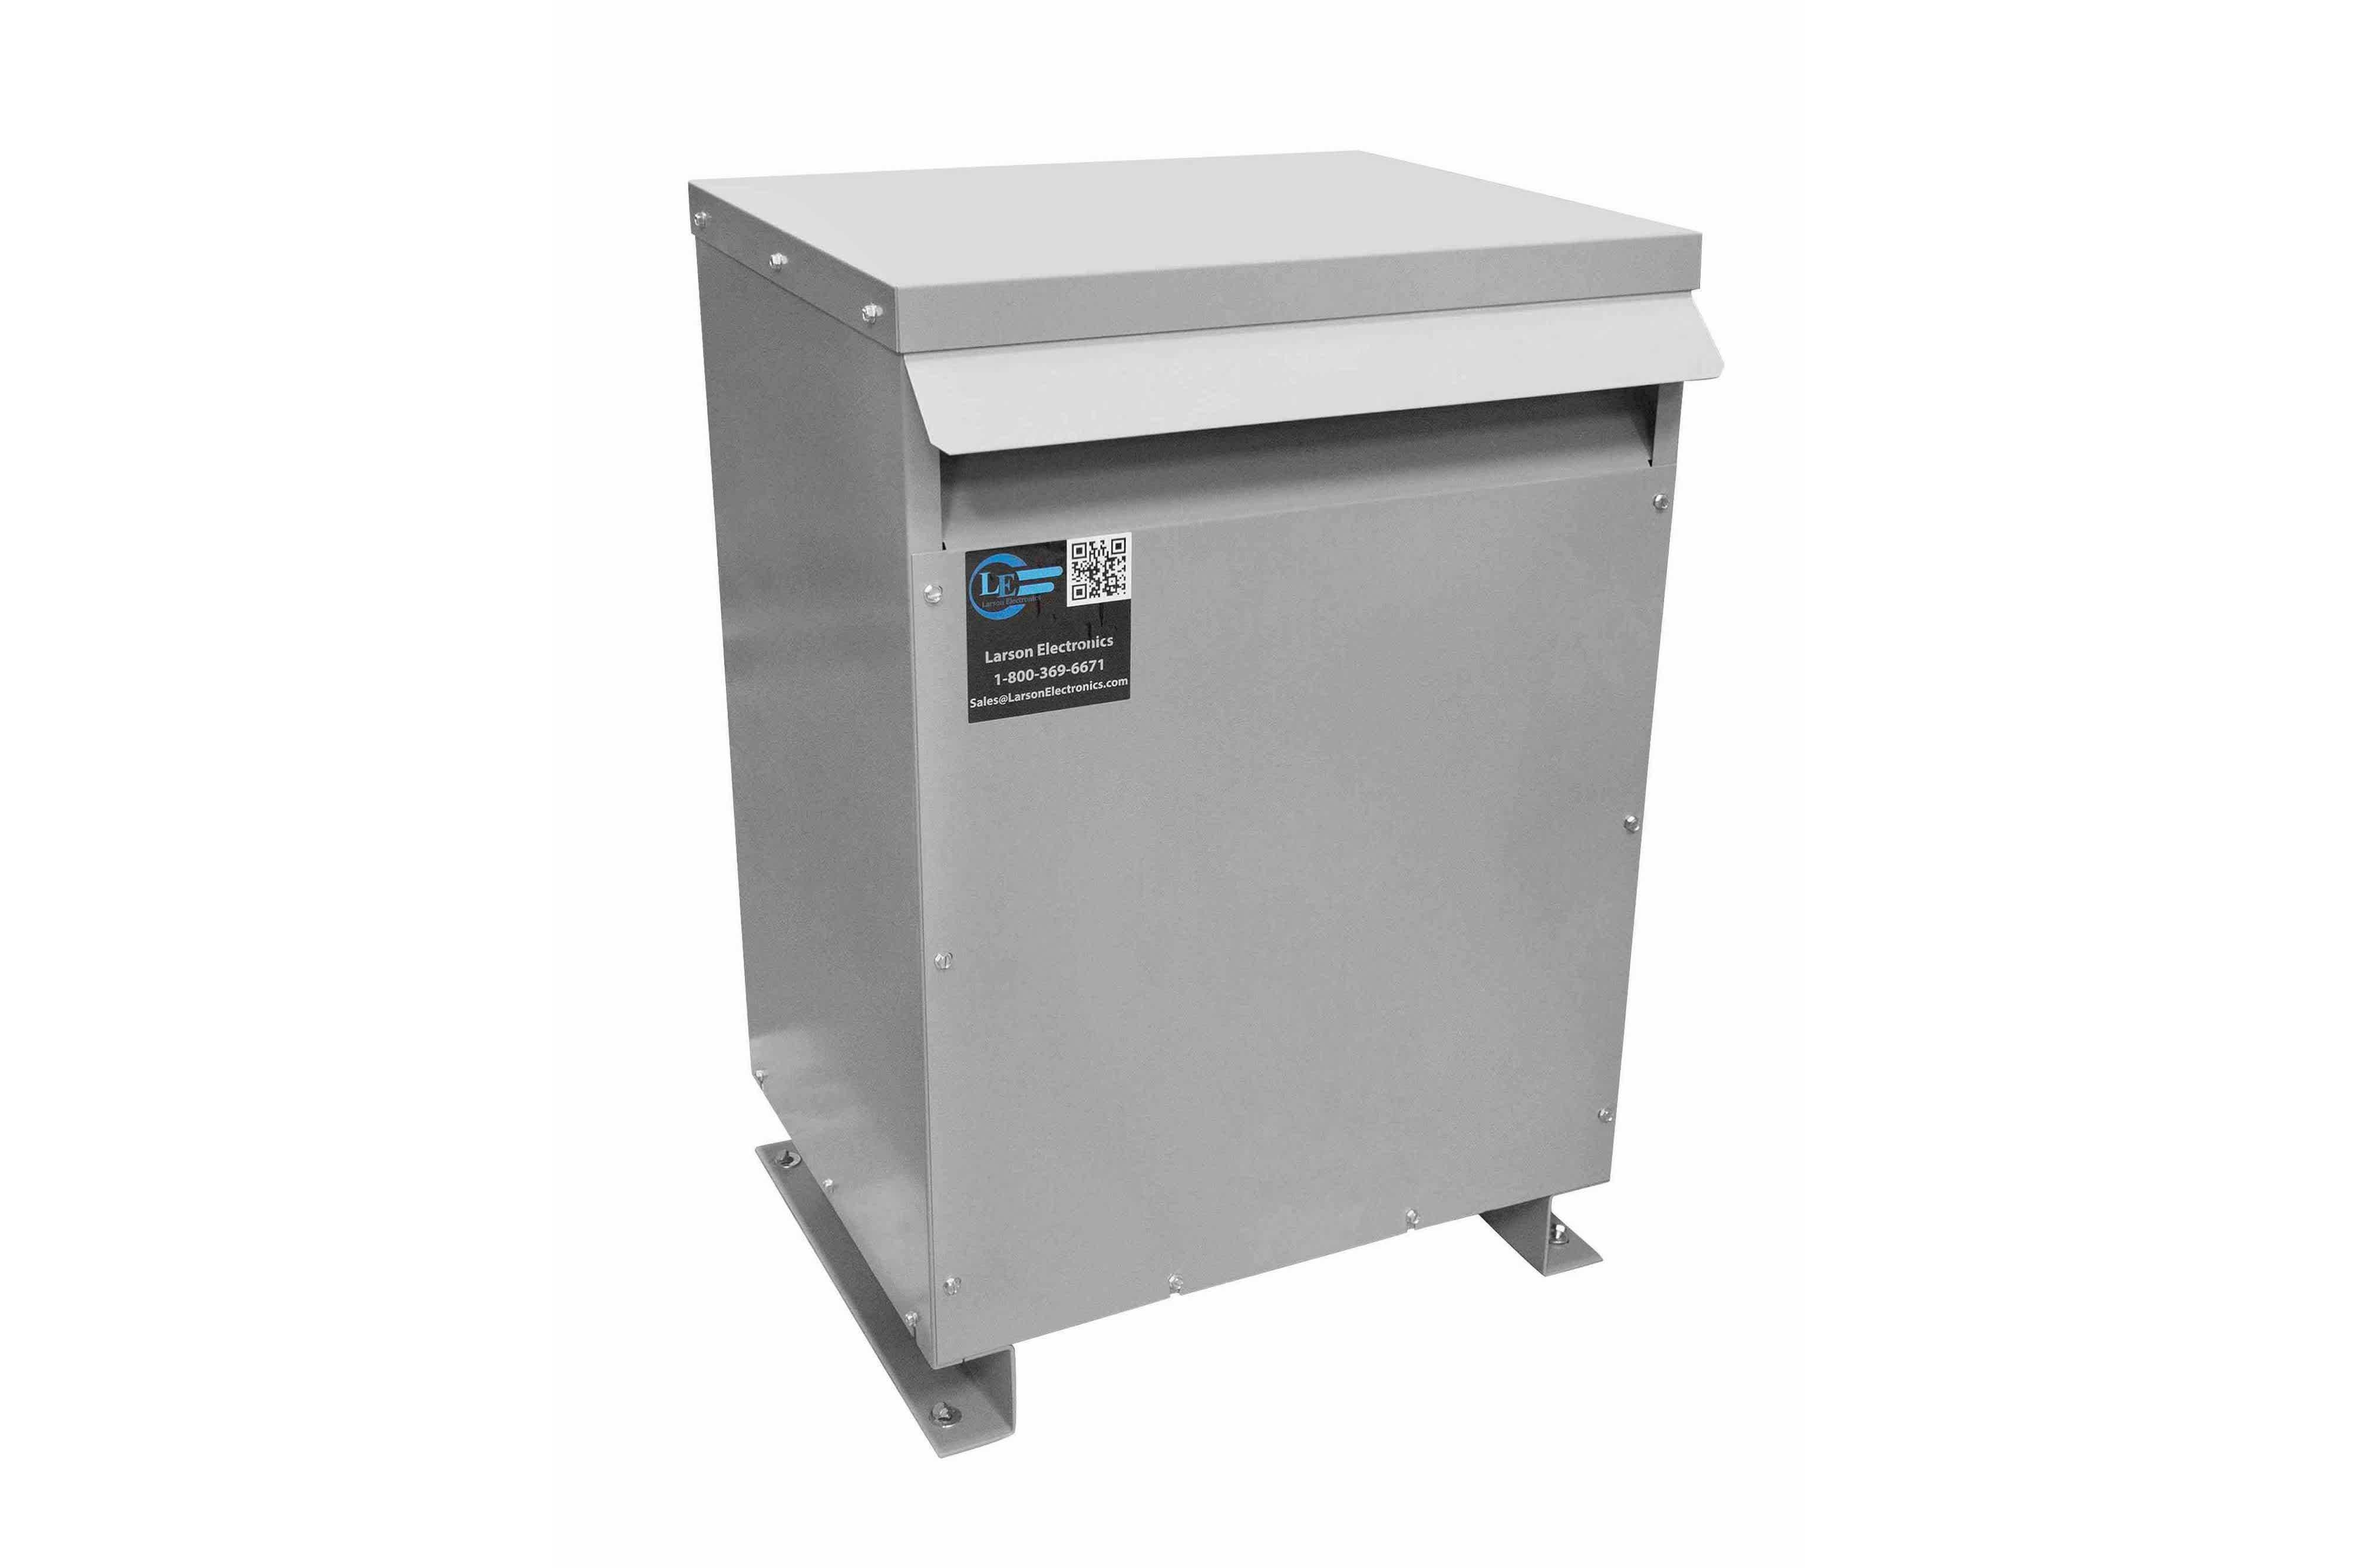 38 kVA 3PH Isolation Transformer, 600V Wye Primary, 240V Delta Secondary, N3R, Ventilated, 60 Hz